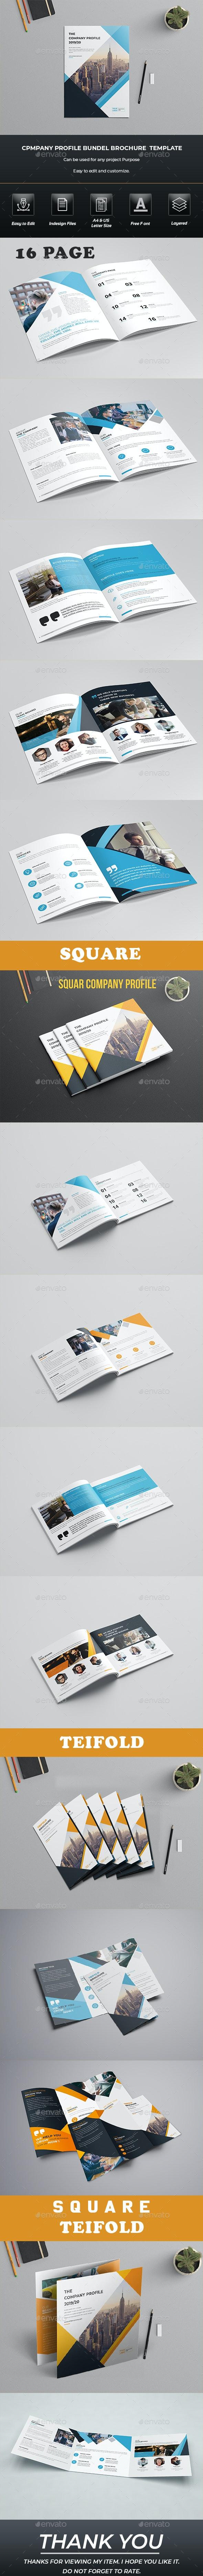 Company Profile Brochure Bundle Template - Brochures Print Templates